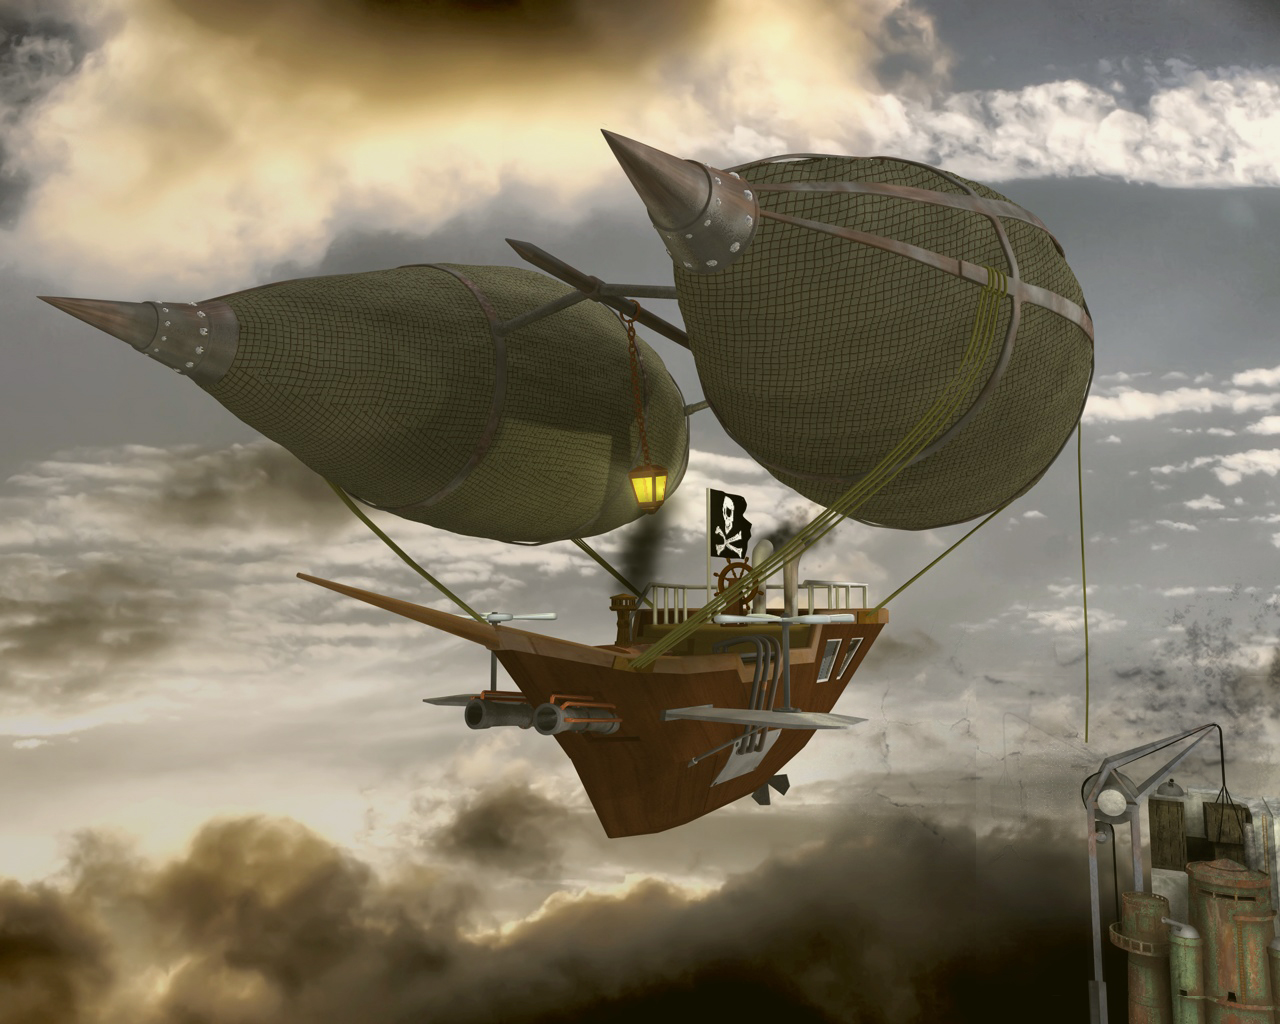 airship_by_jambioo.jpg